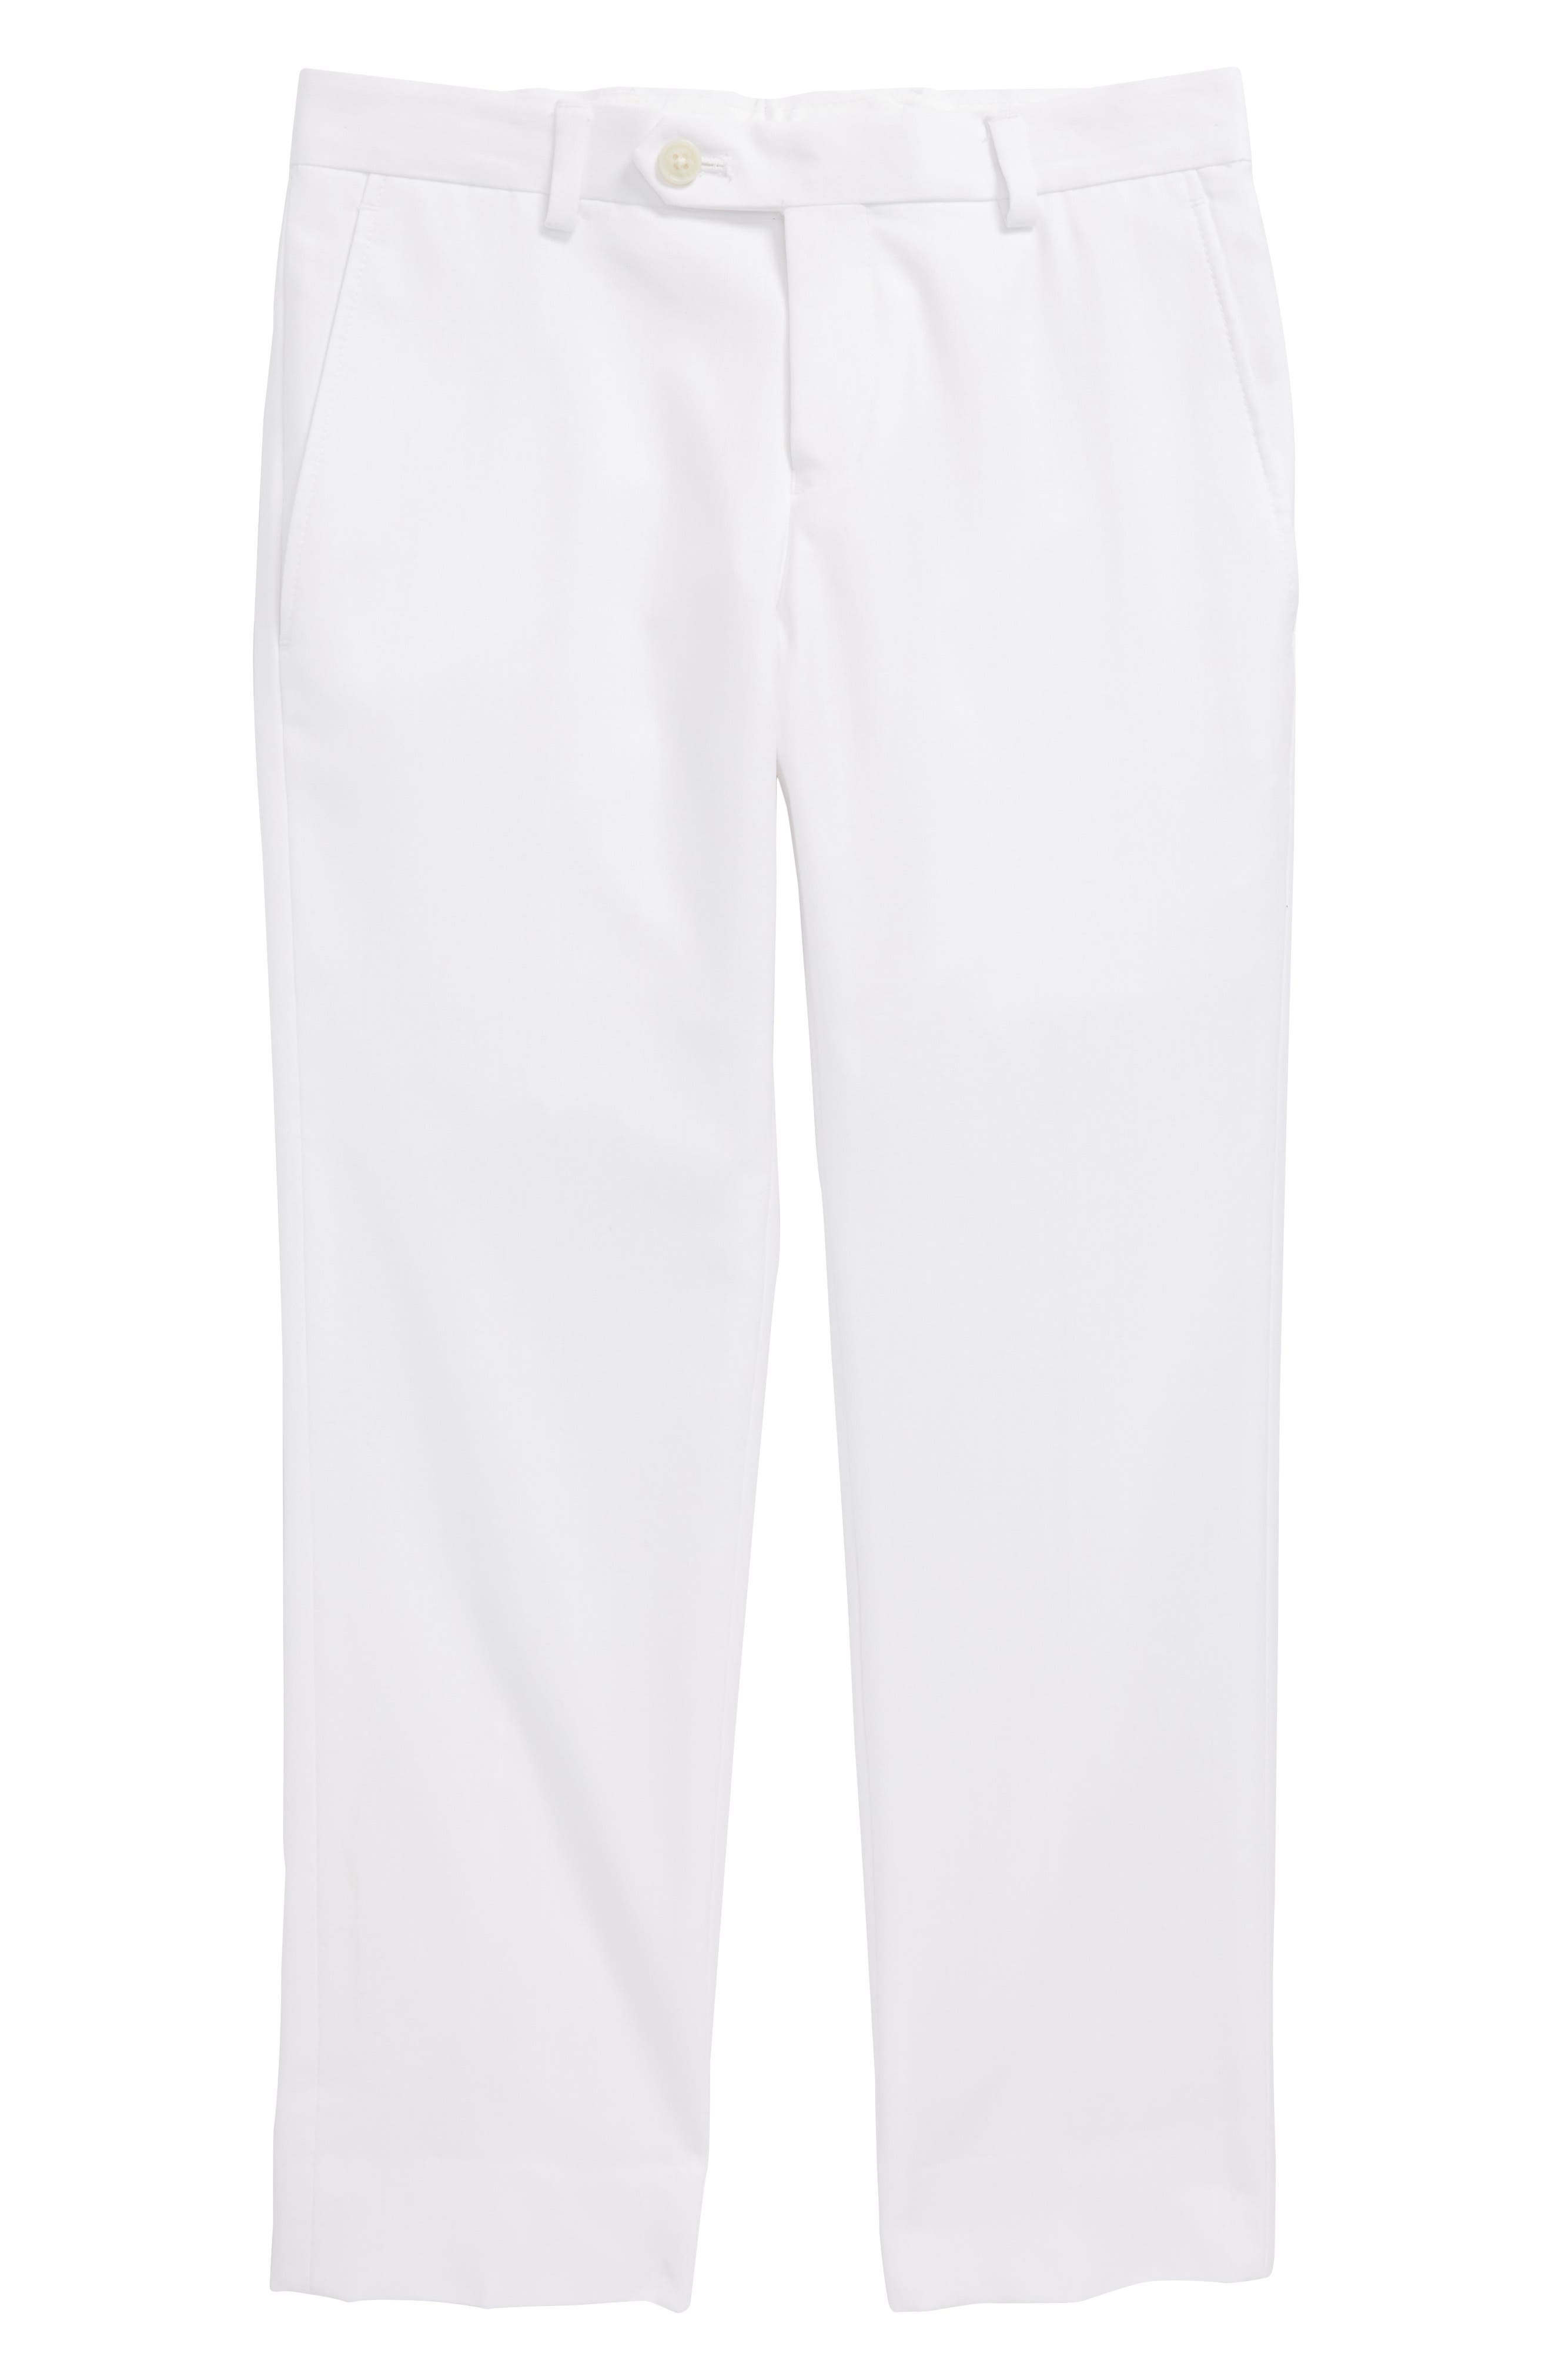 Michael Kors Flat Front Pants (Big Boys)